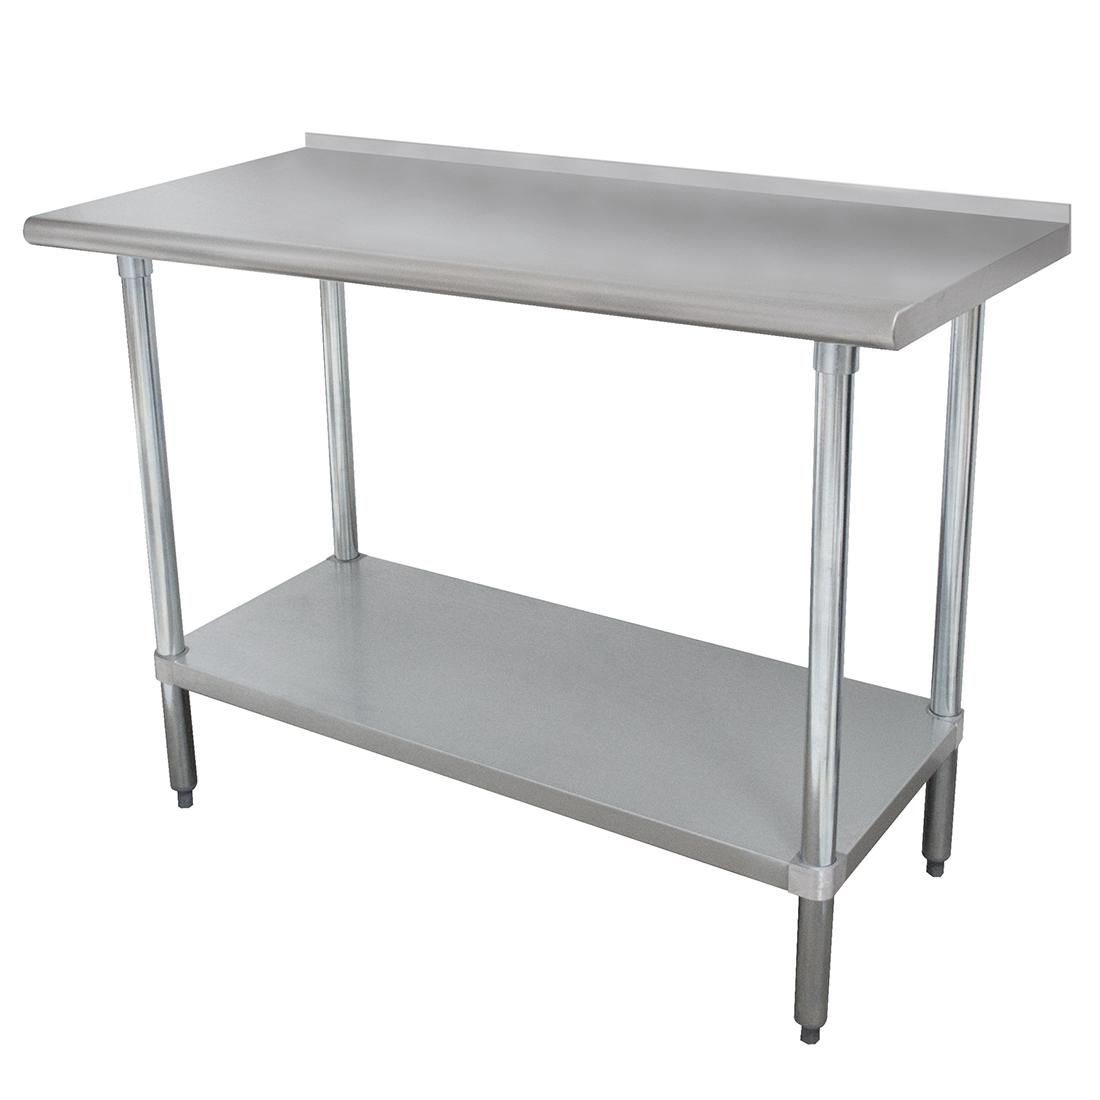 Advance Tabco FLG-242 work table,  24